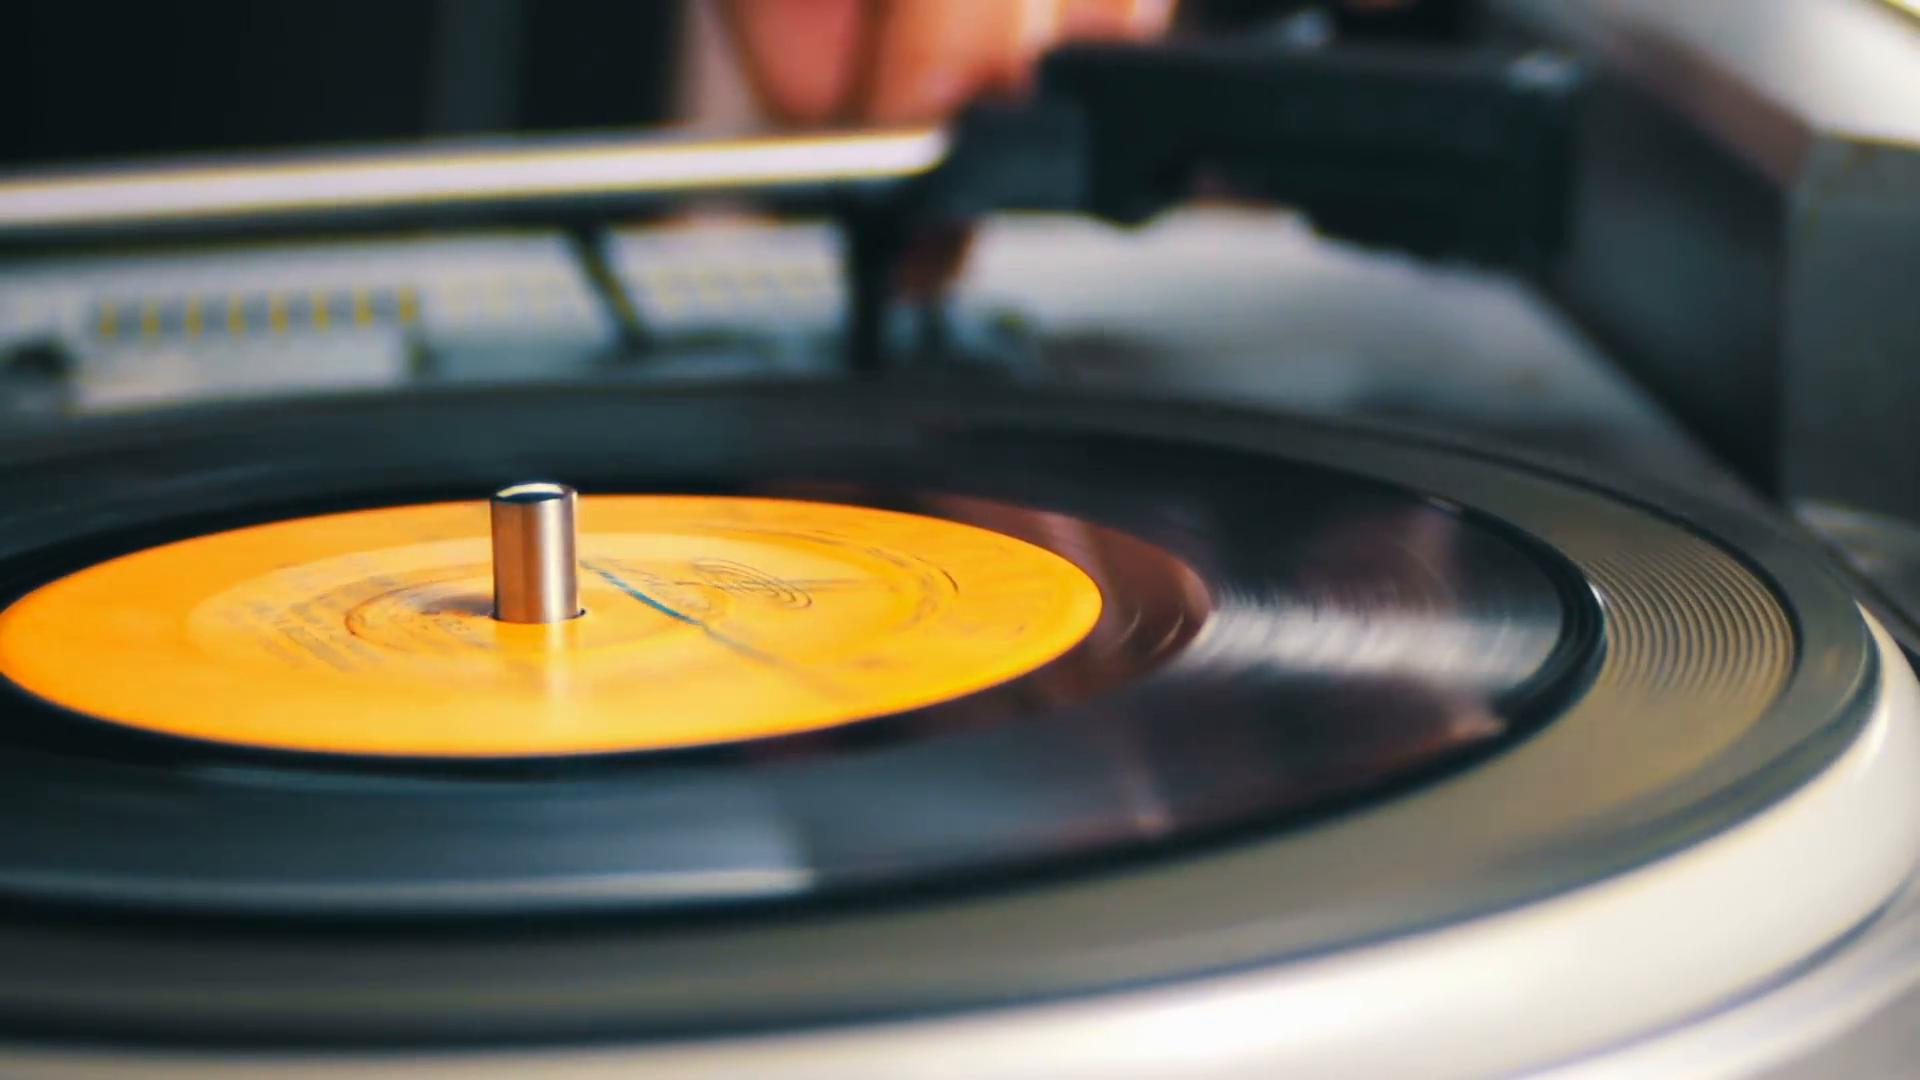 Old Vinyl Record Spinning Stock Video Footage - Videoblocks